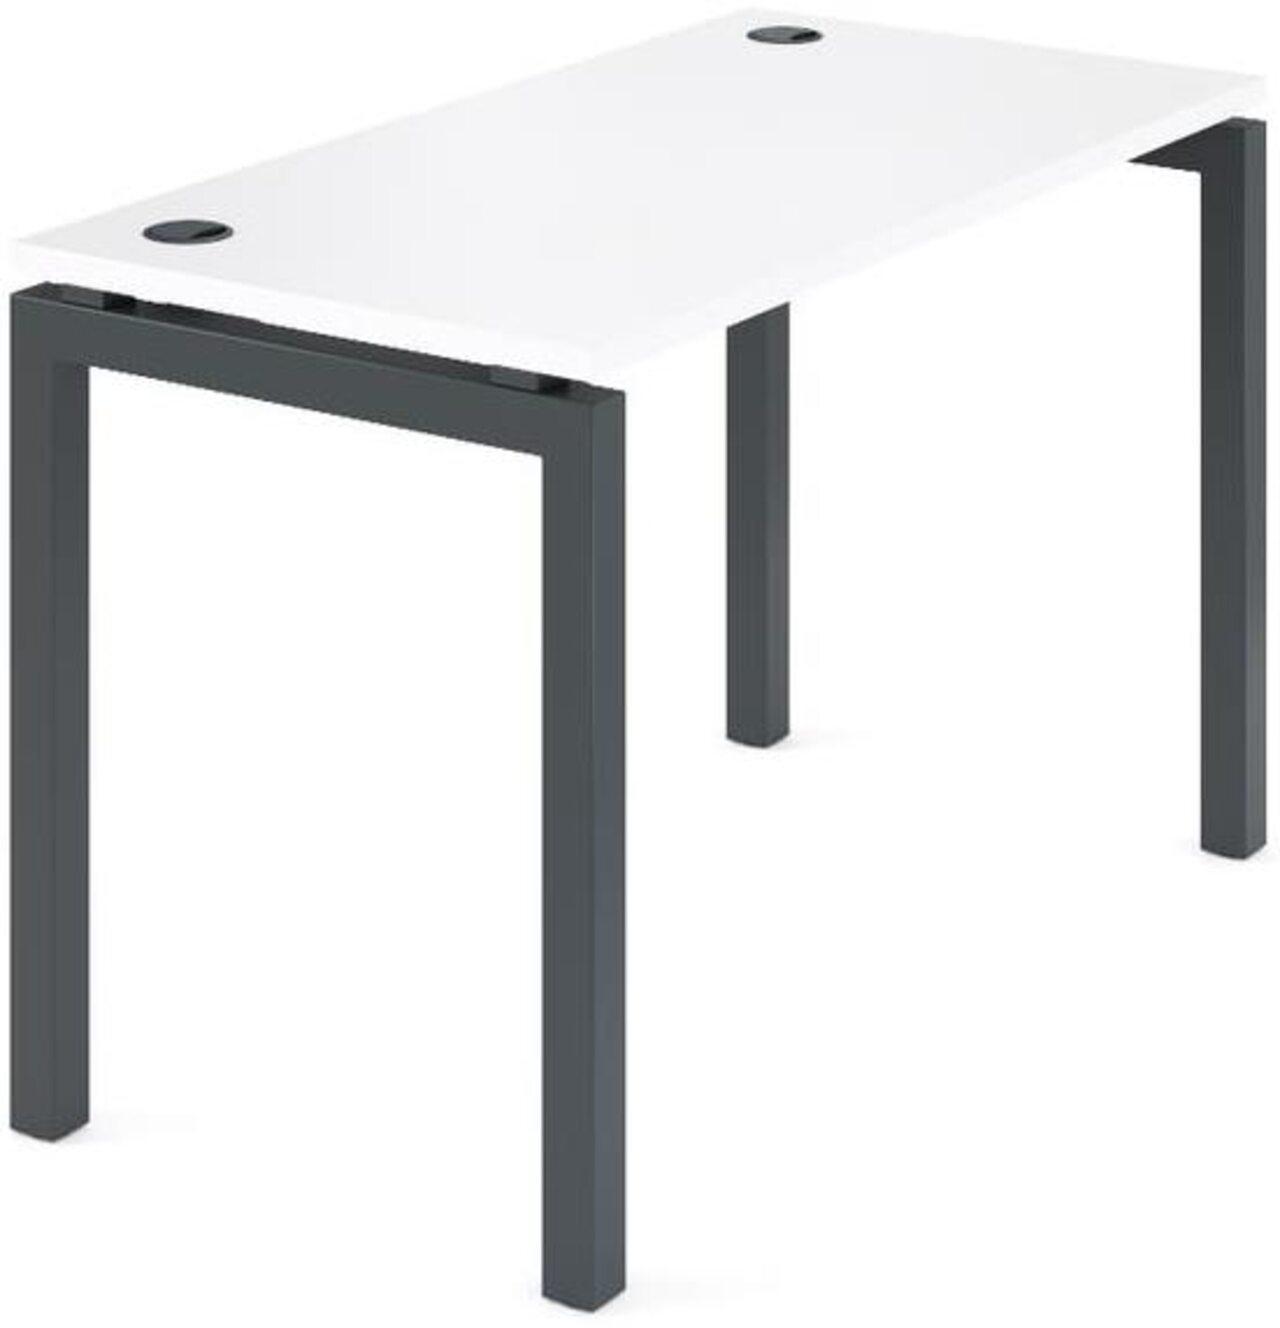 Стол на металлокаркасе  Арго 120x60x76 - фото 5